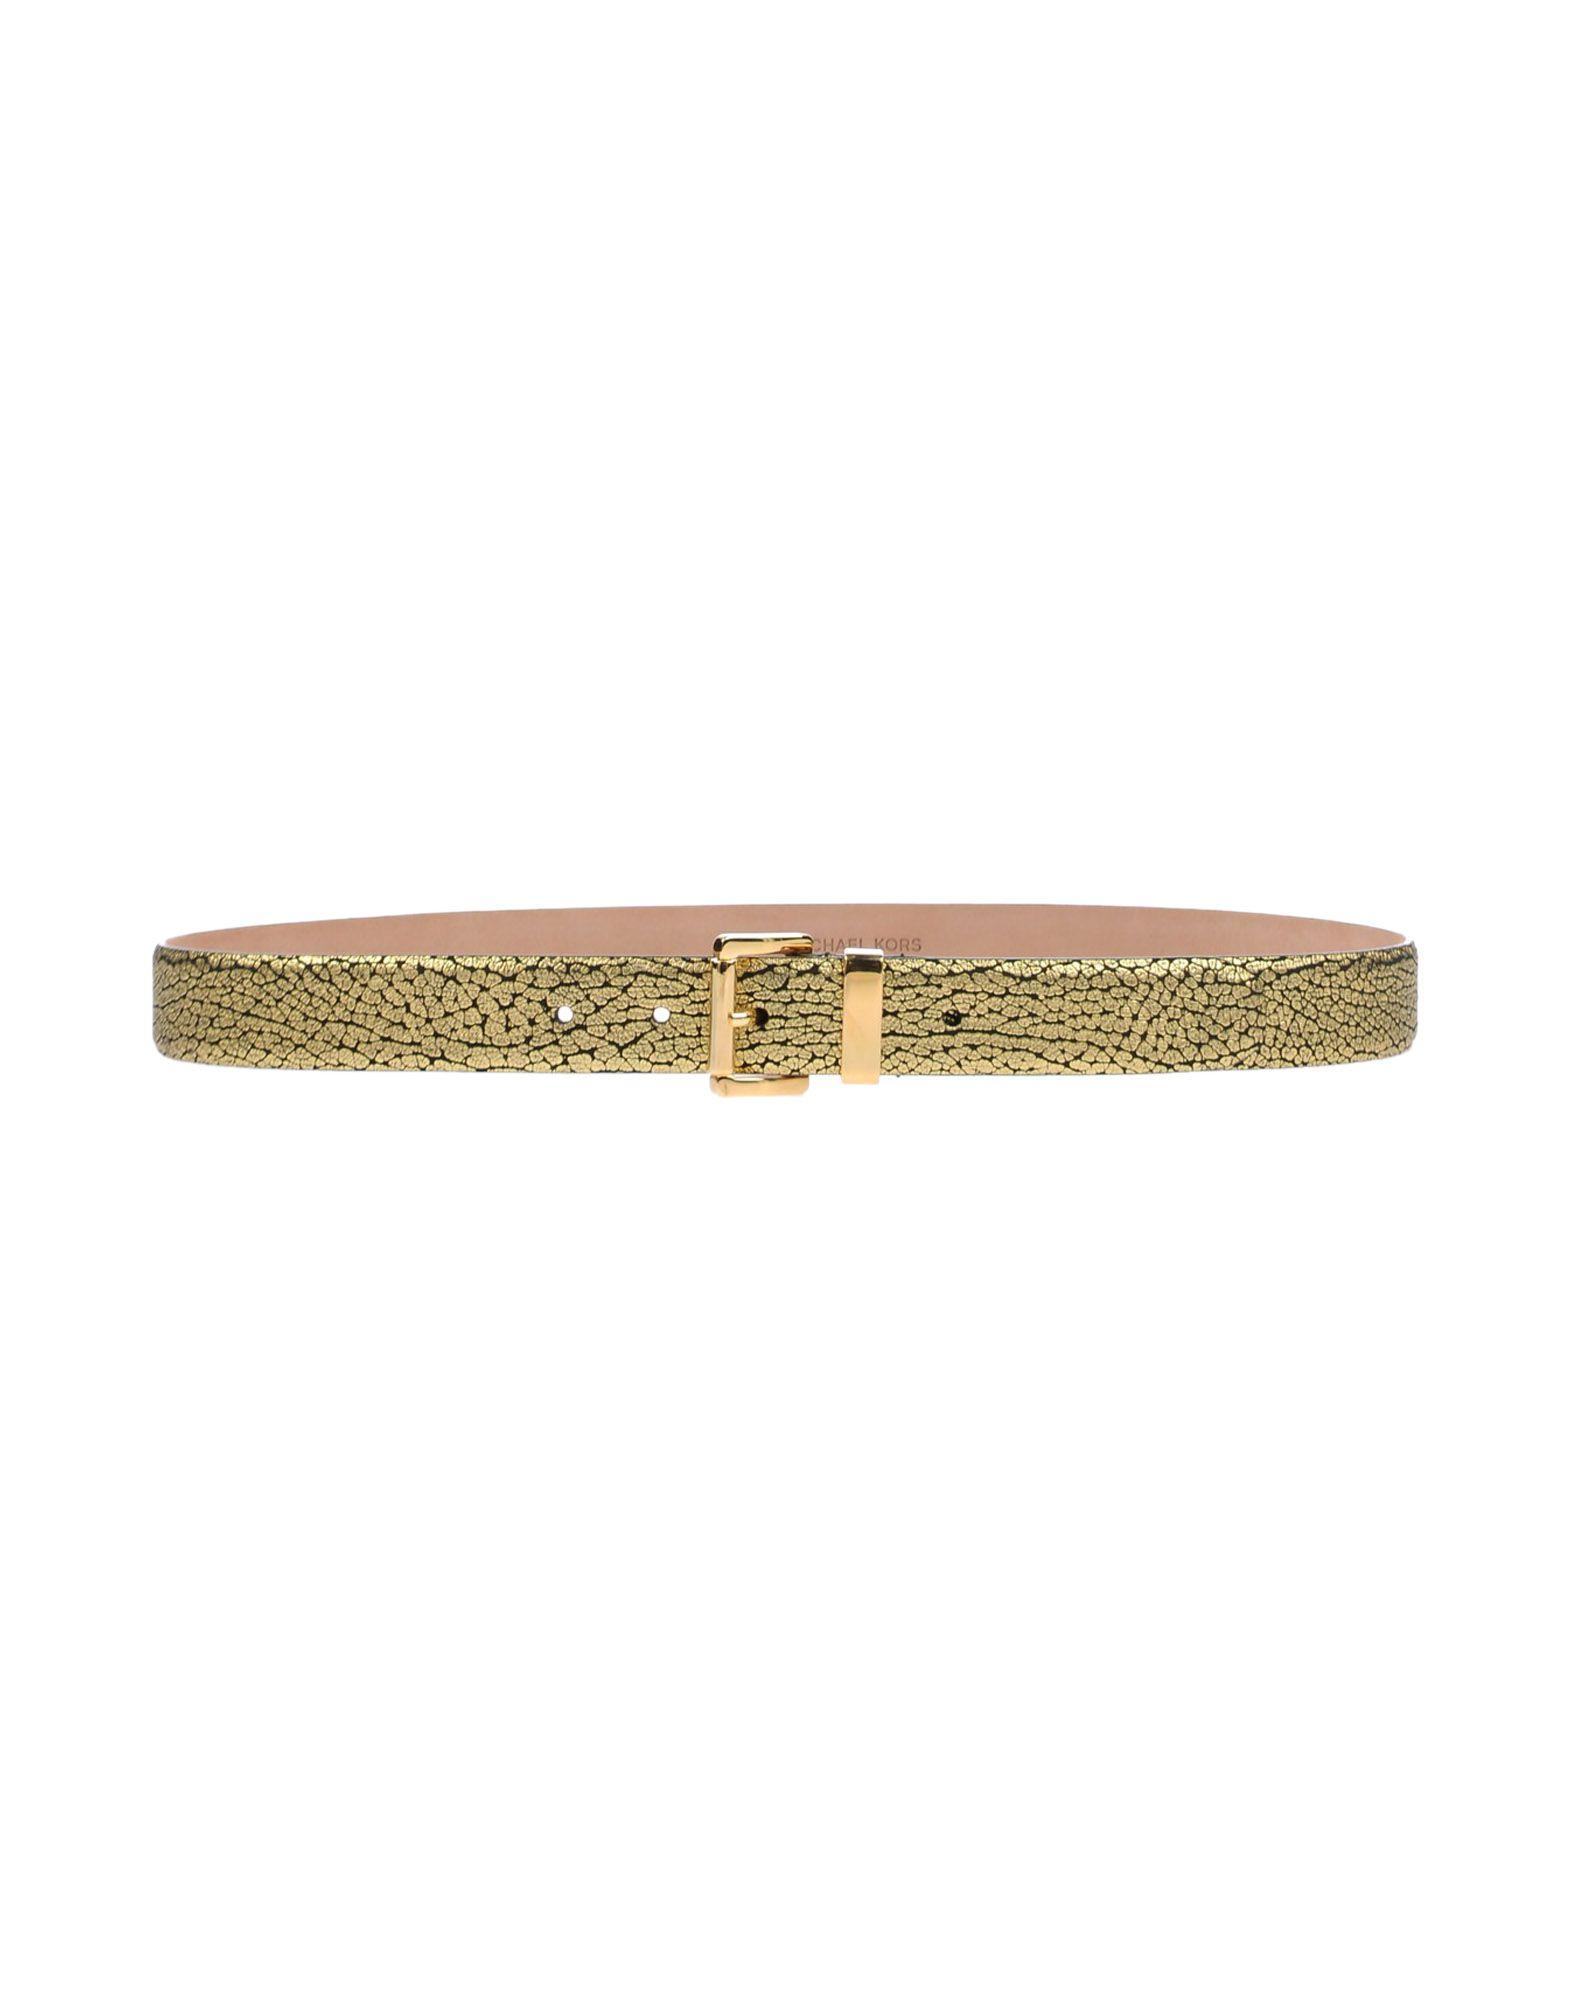 MICHAEL KORS Damen Gürtel Farbe Gold Größe 6